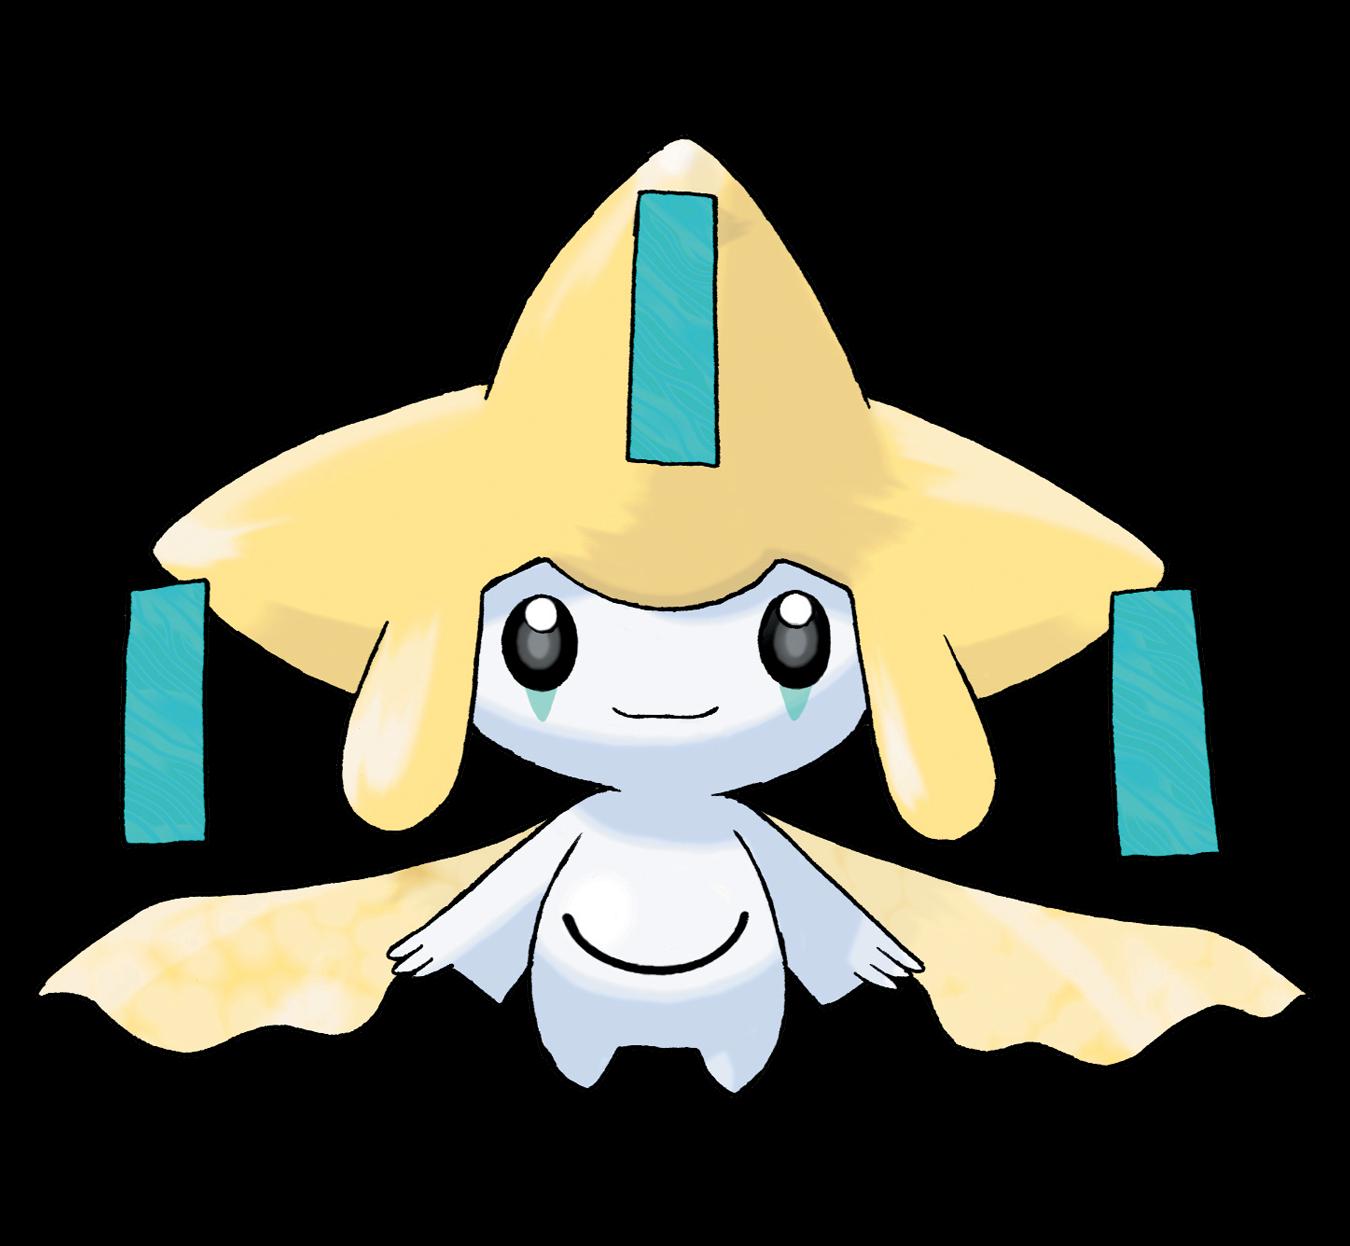 Pokemon Legendario; R. Hoenn: Jirachi Jirachi